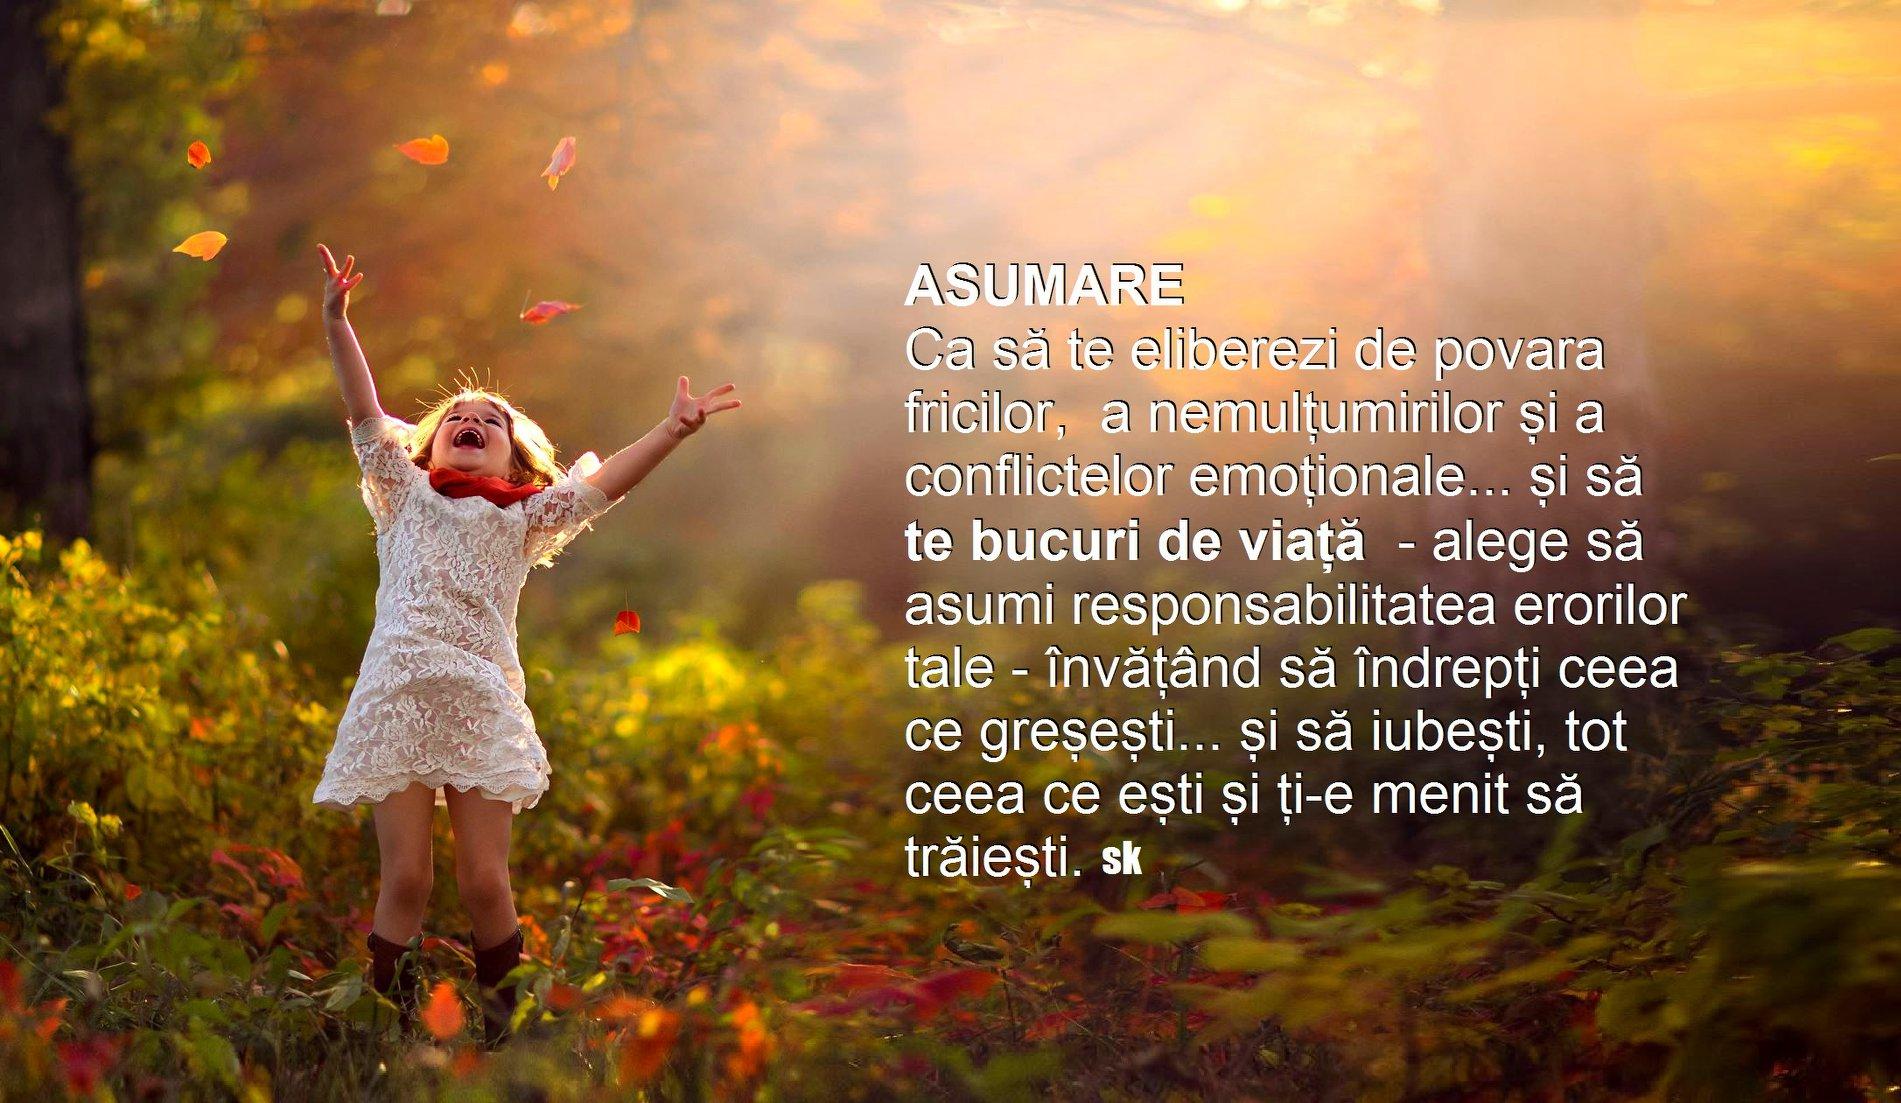 asumare